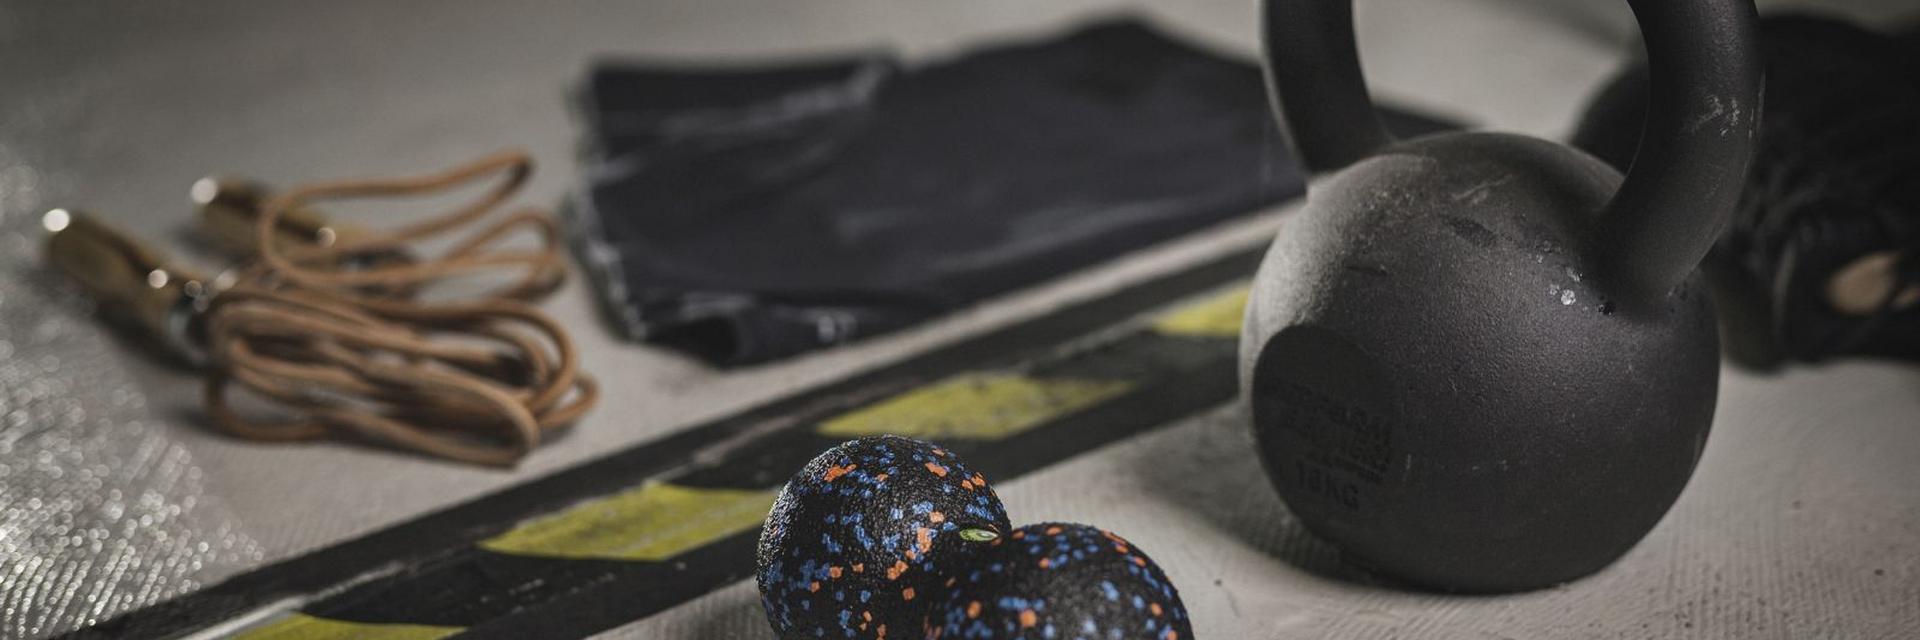 Diverse Trainingsutensilien liegen auf dem Fußboden.